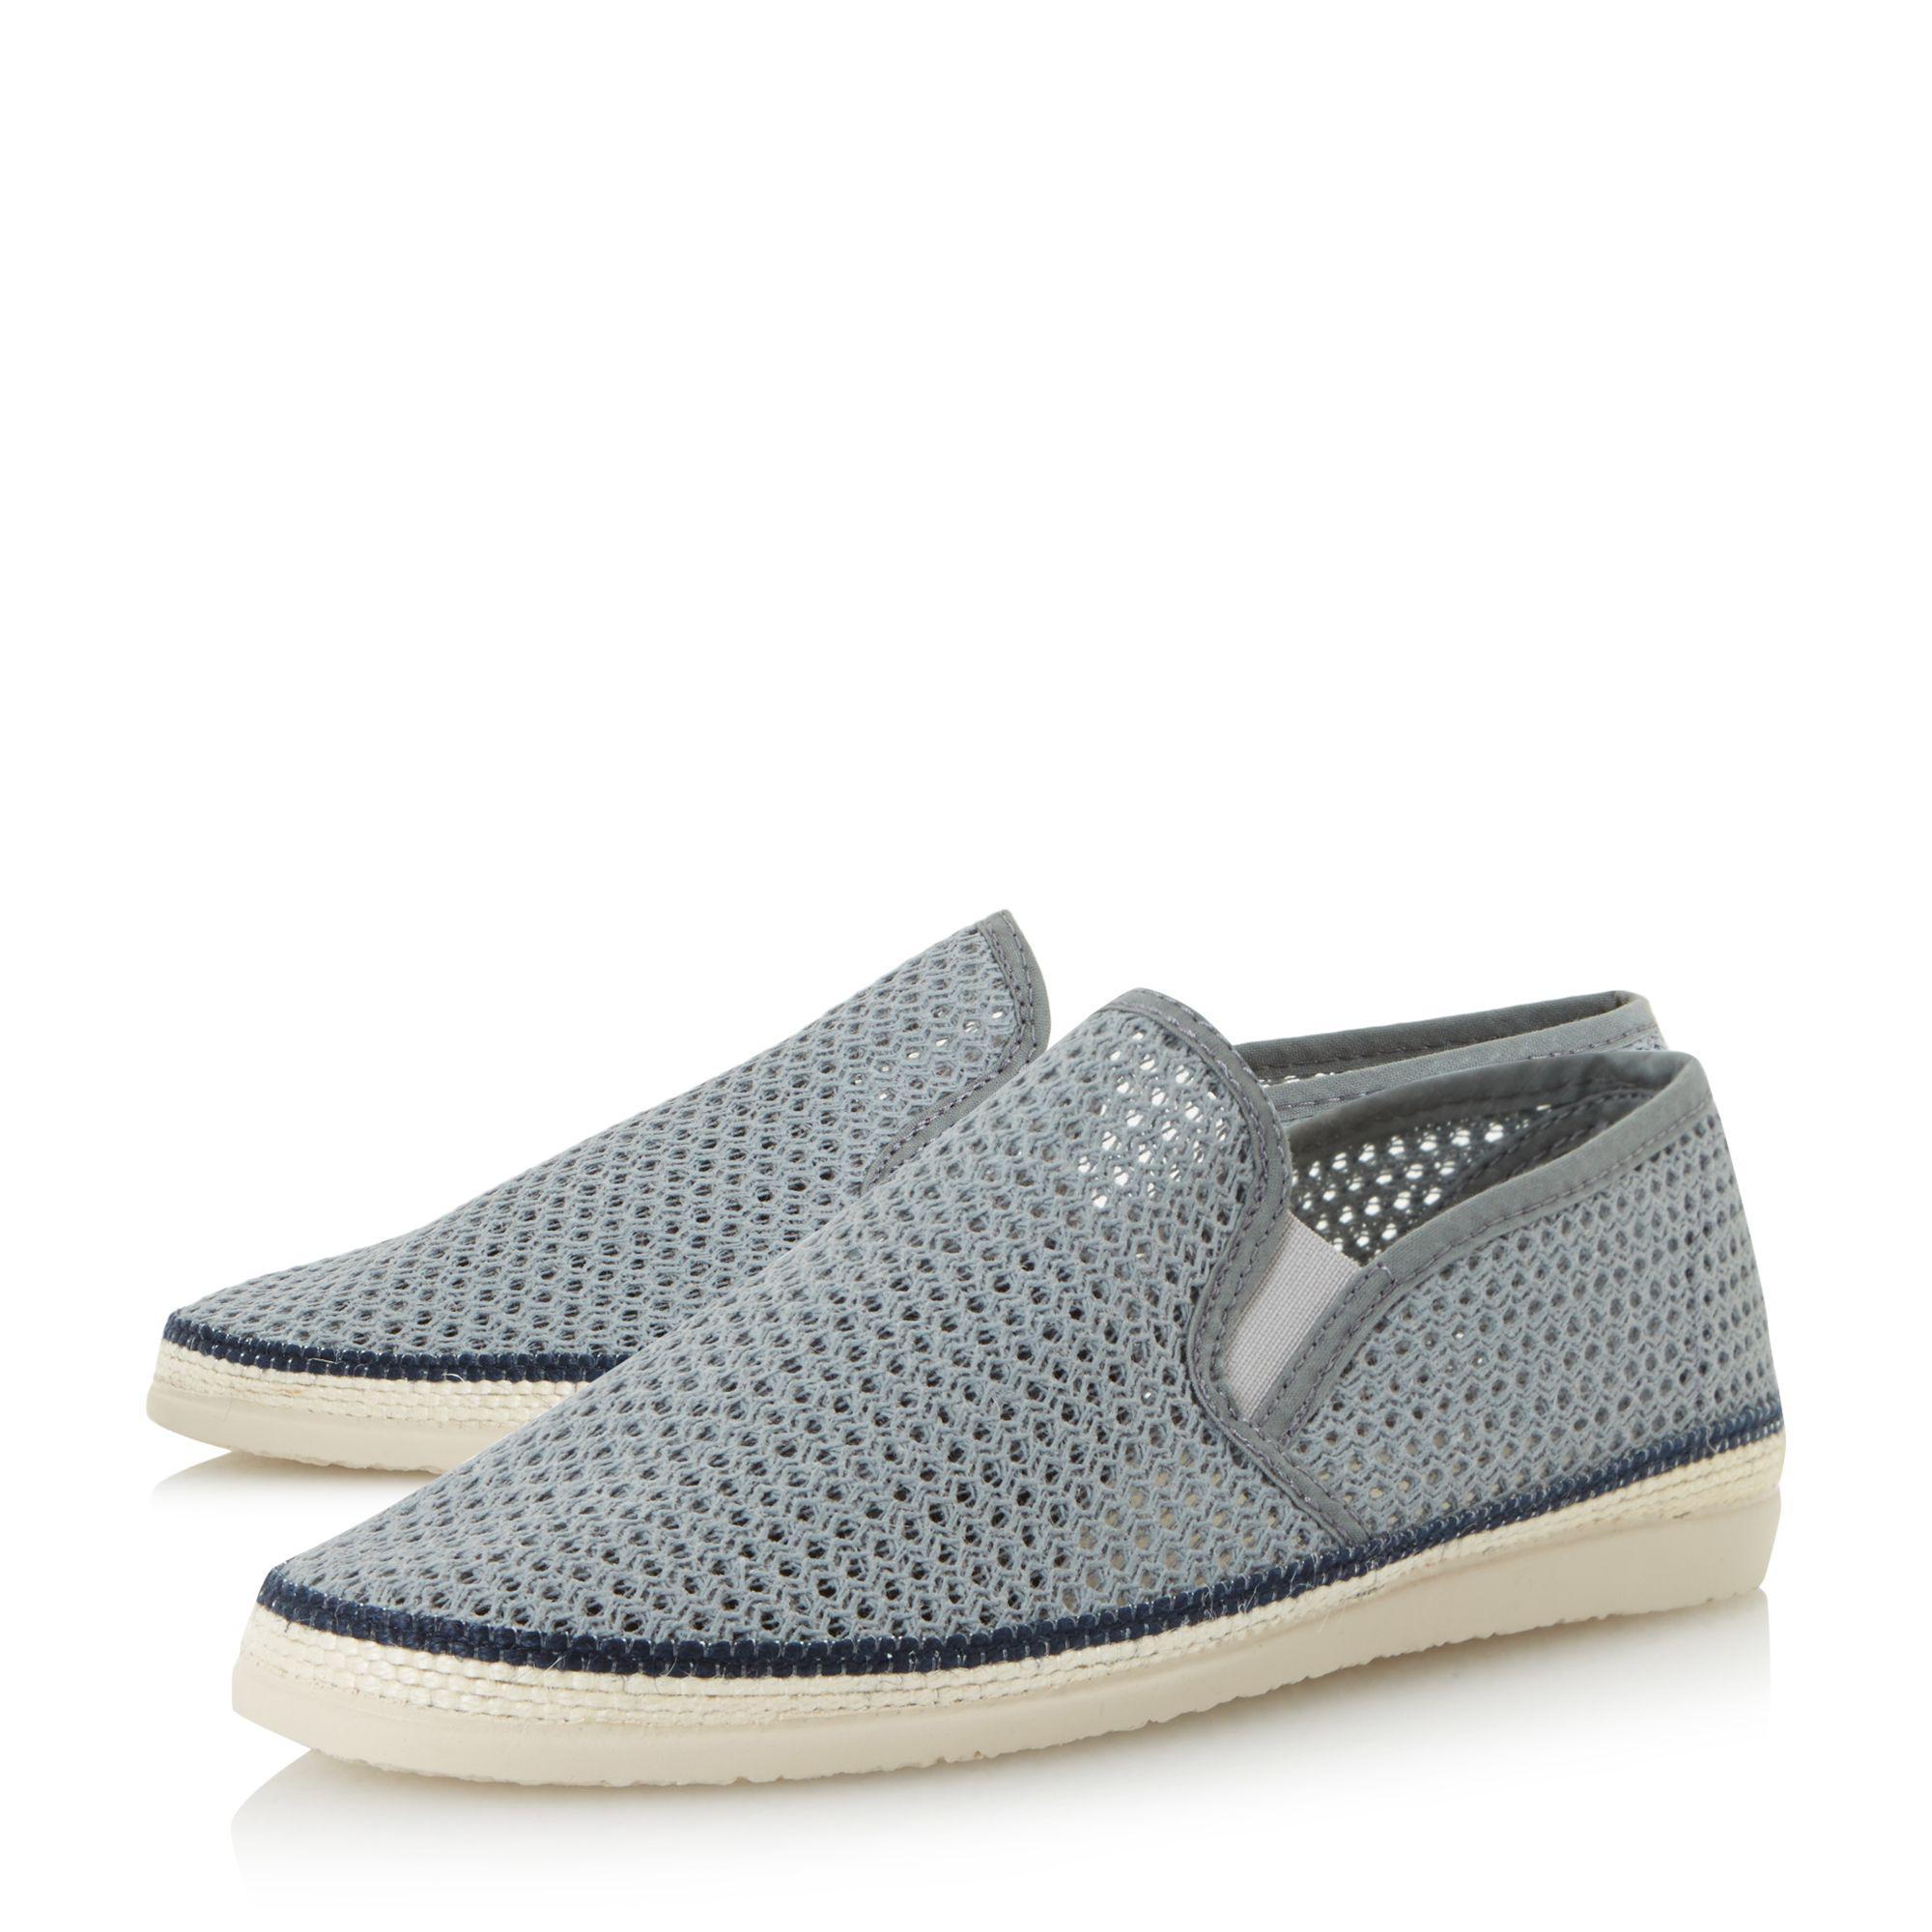 afda99b08 Bertie - Gray Grey 'fresh' Mesh Detail Espadrille Shoes for Men - Lyst.  View fullscreen